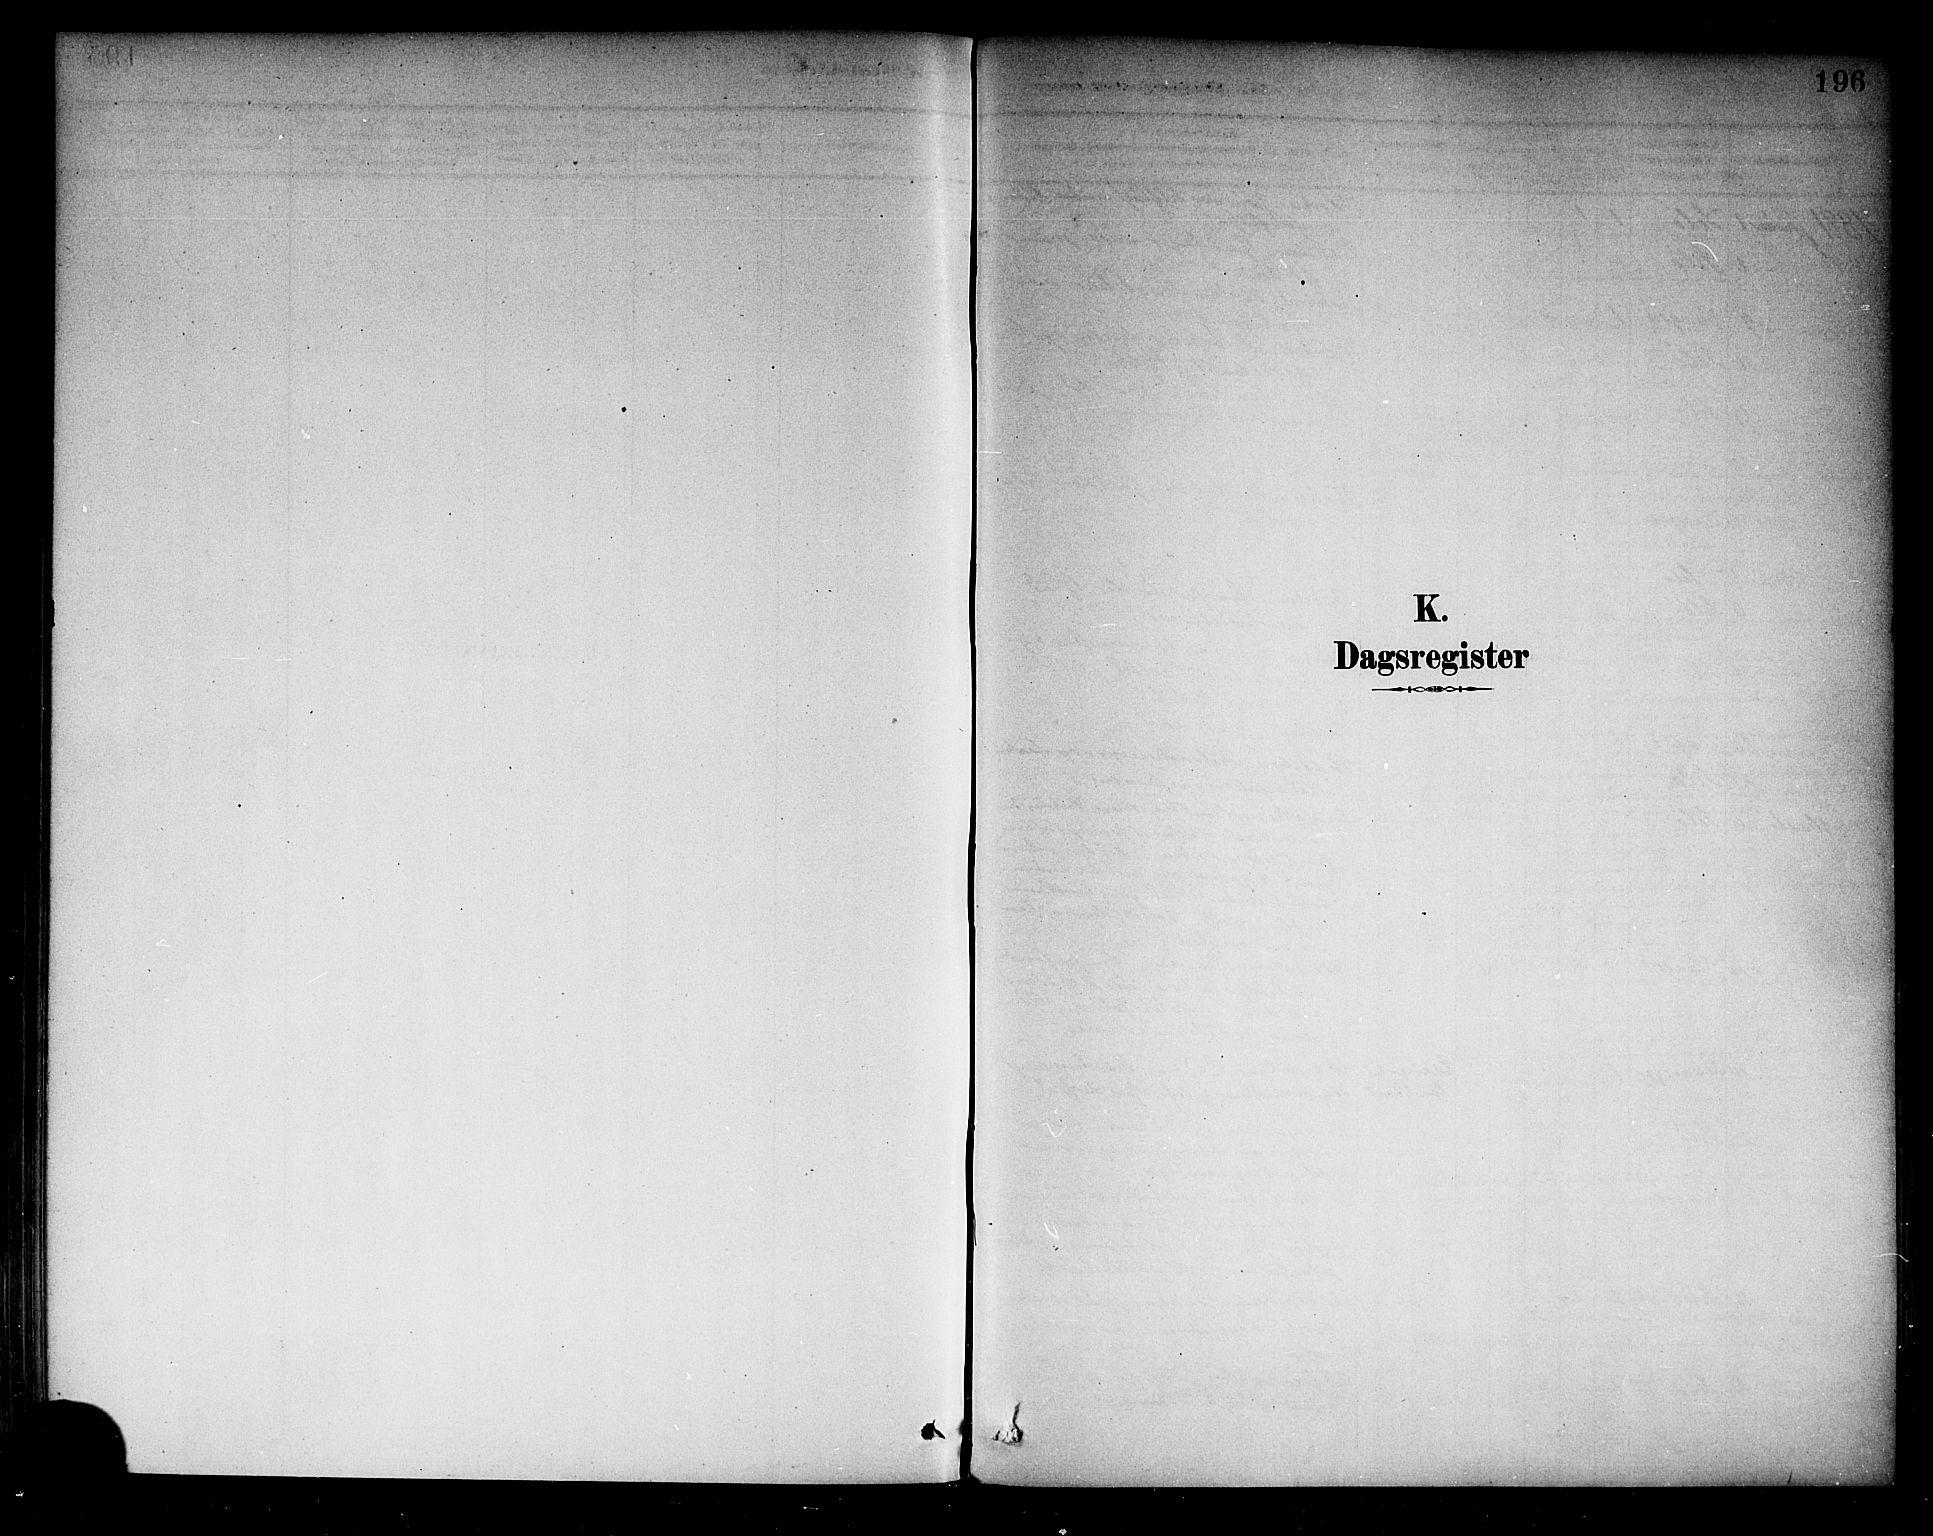 SAB, Selje sokneprestembete*, Ministerialbok nr. B 1, 1881-1890, s. 196